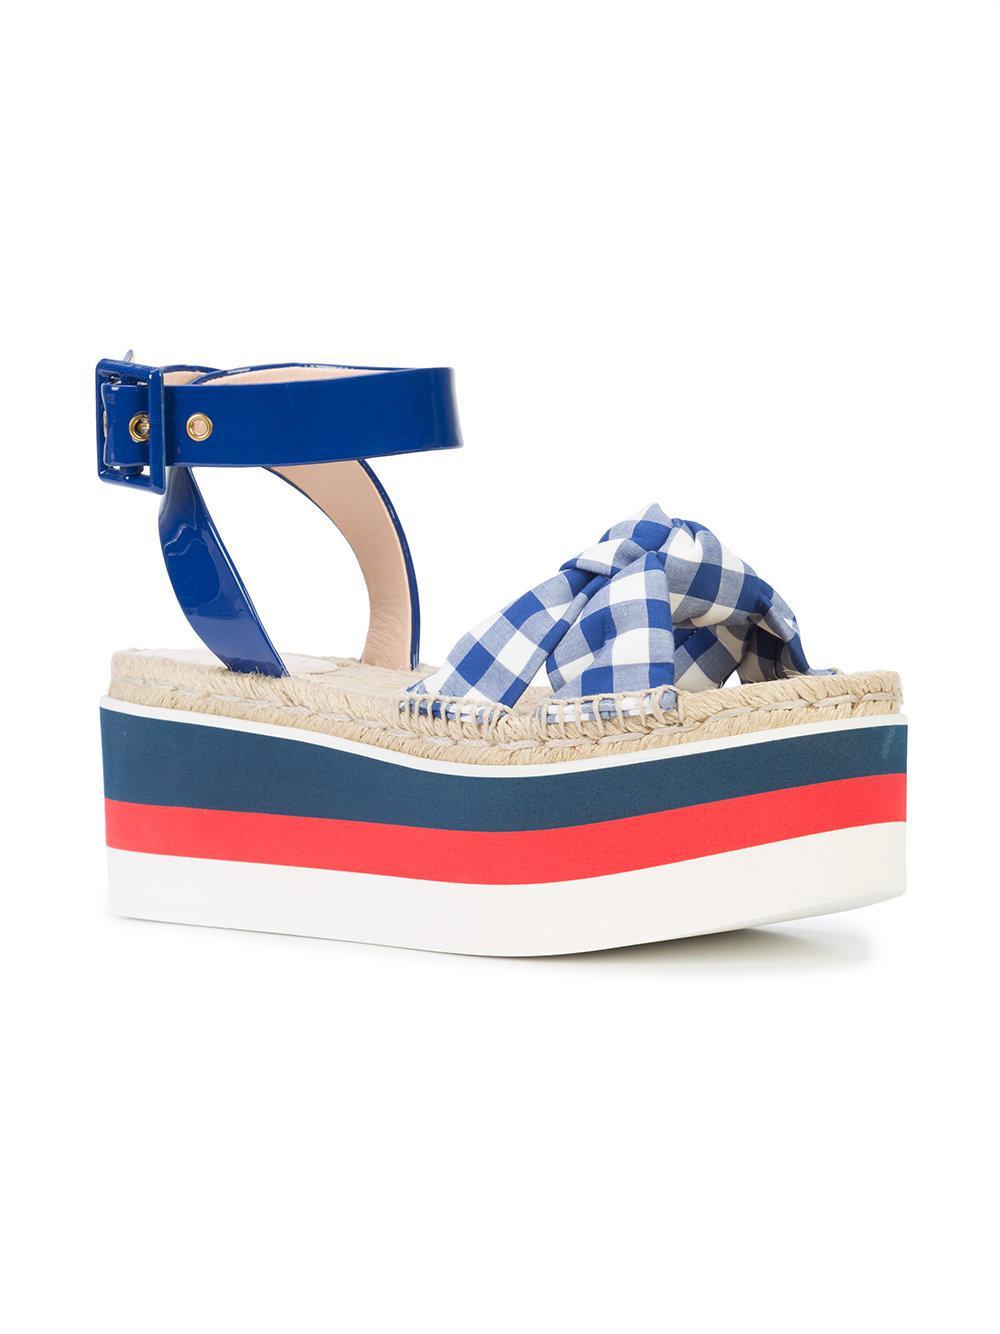 295327b486ea50 Gucci - Blue Gingham Flatform Sandals - Lyst. View fullscreen